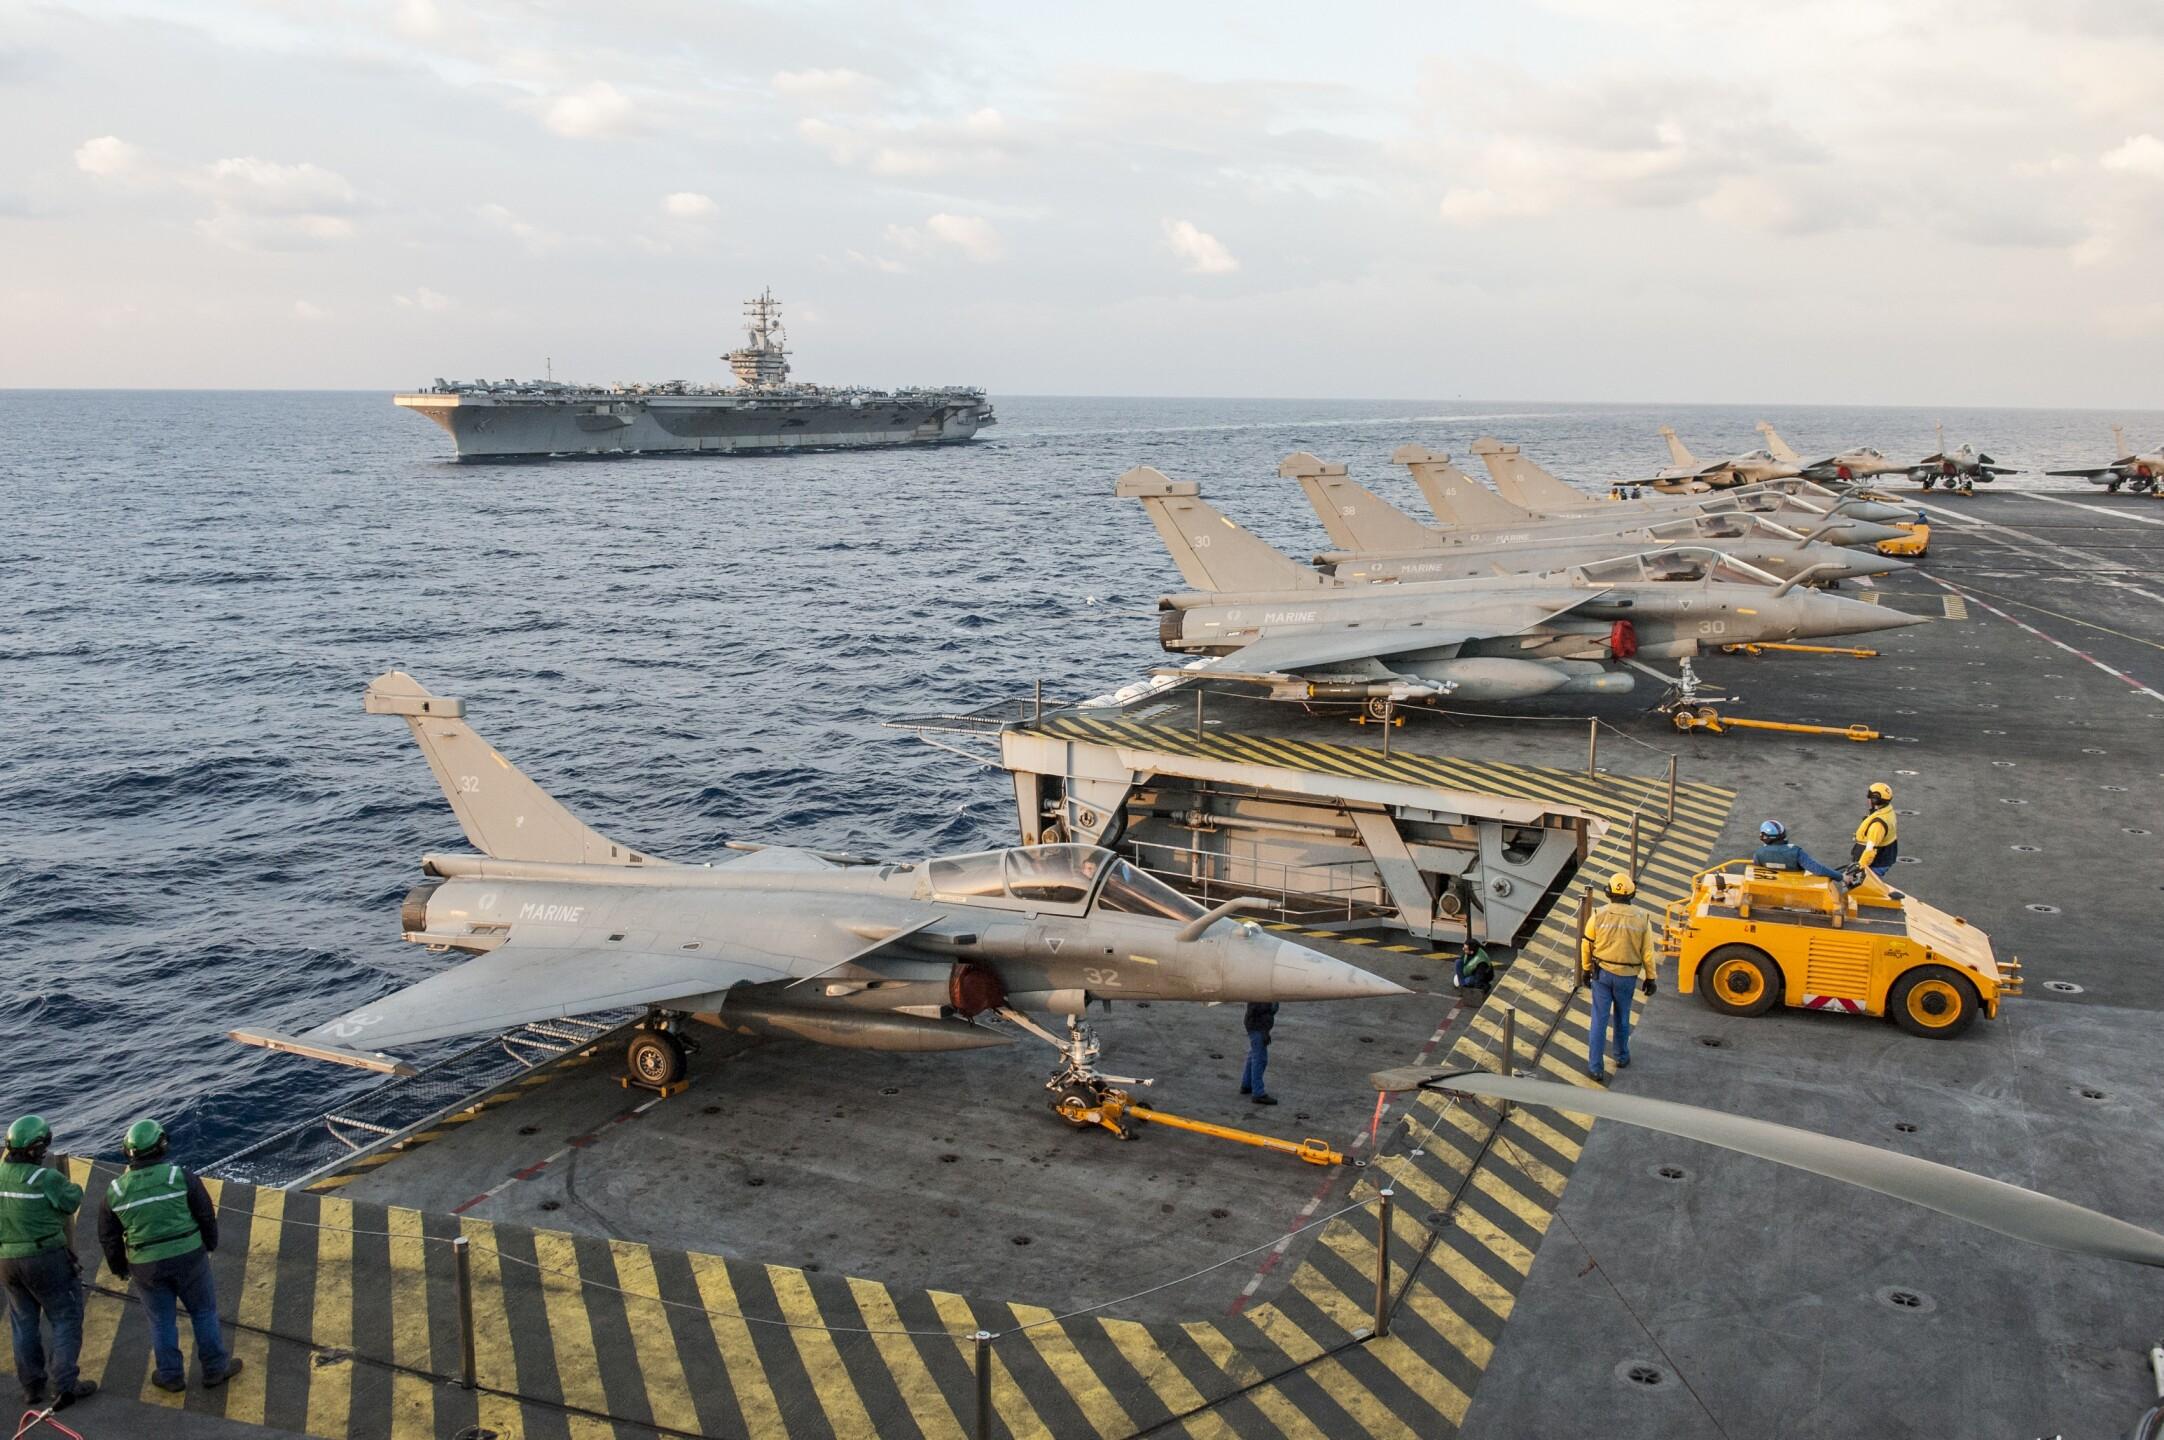 Photos: French Navy aviators join U.S. Navy aviators fortraining